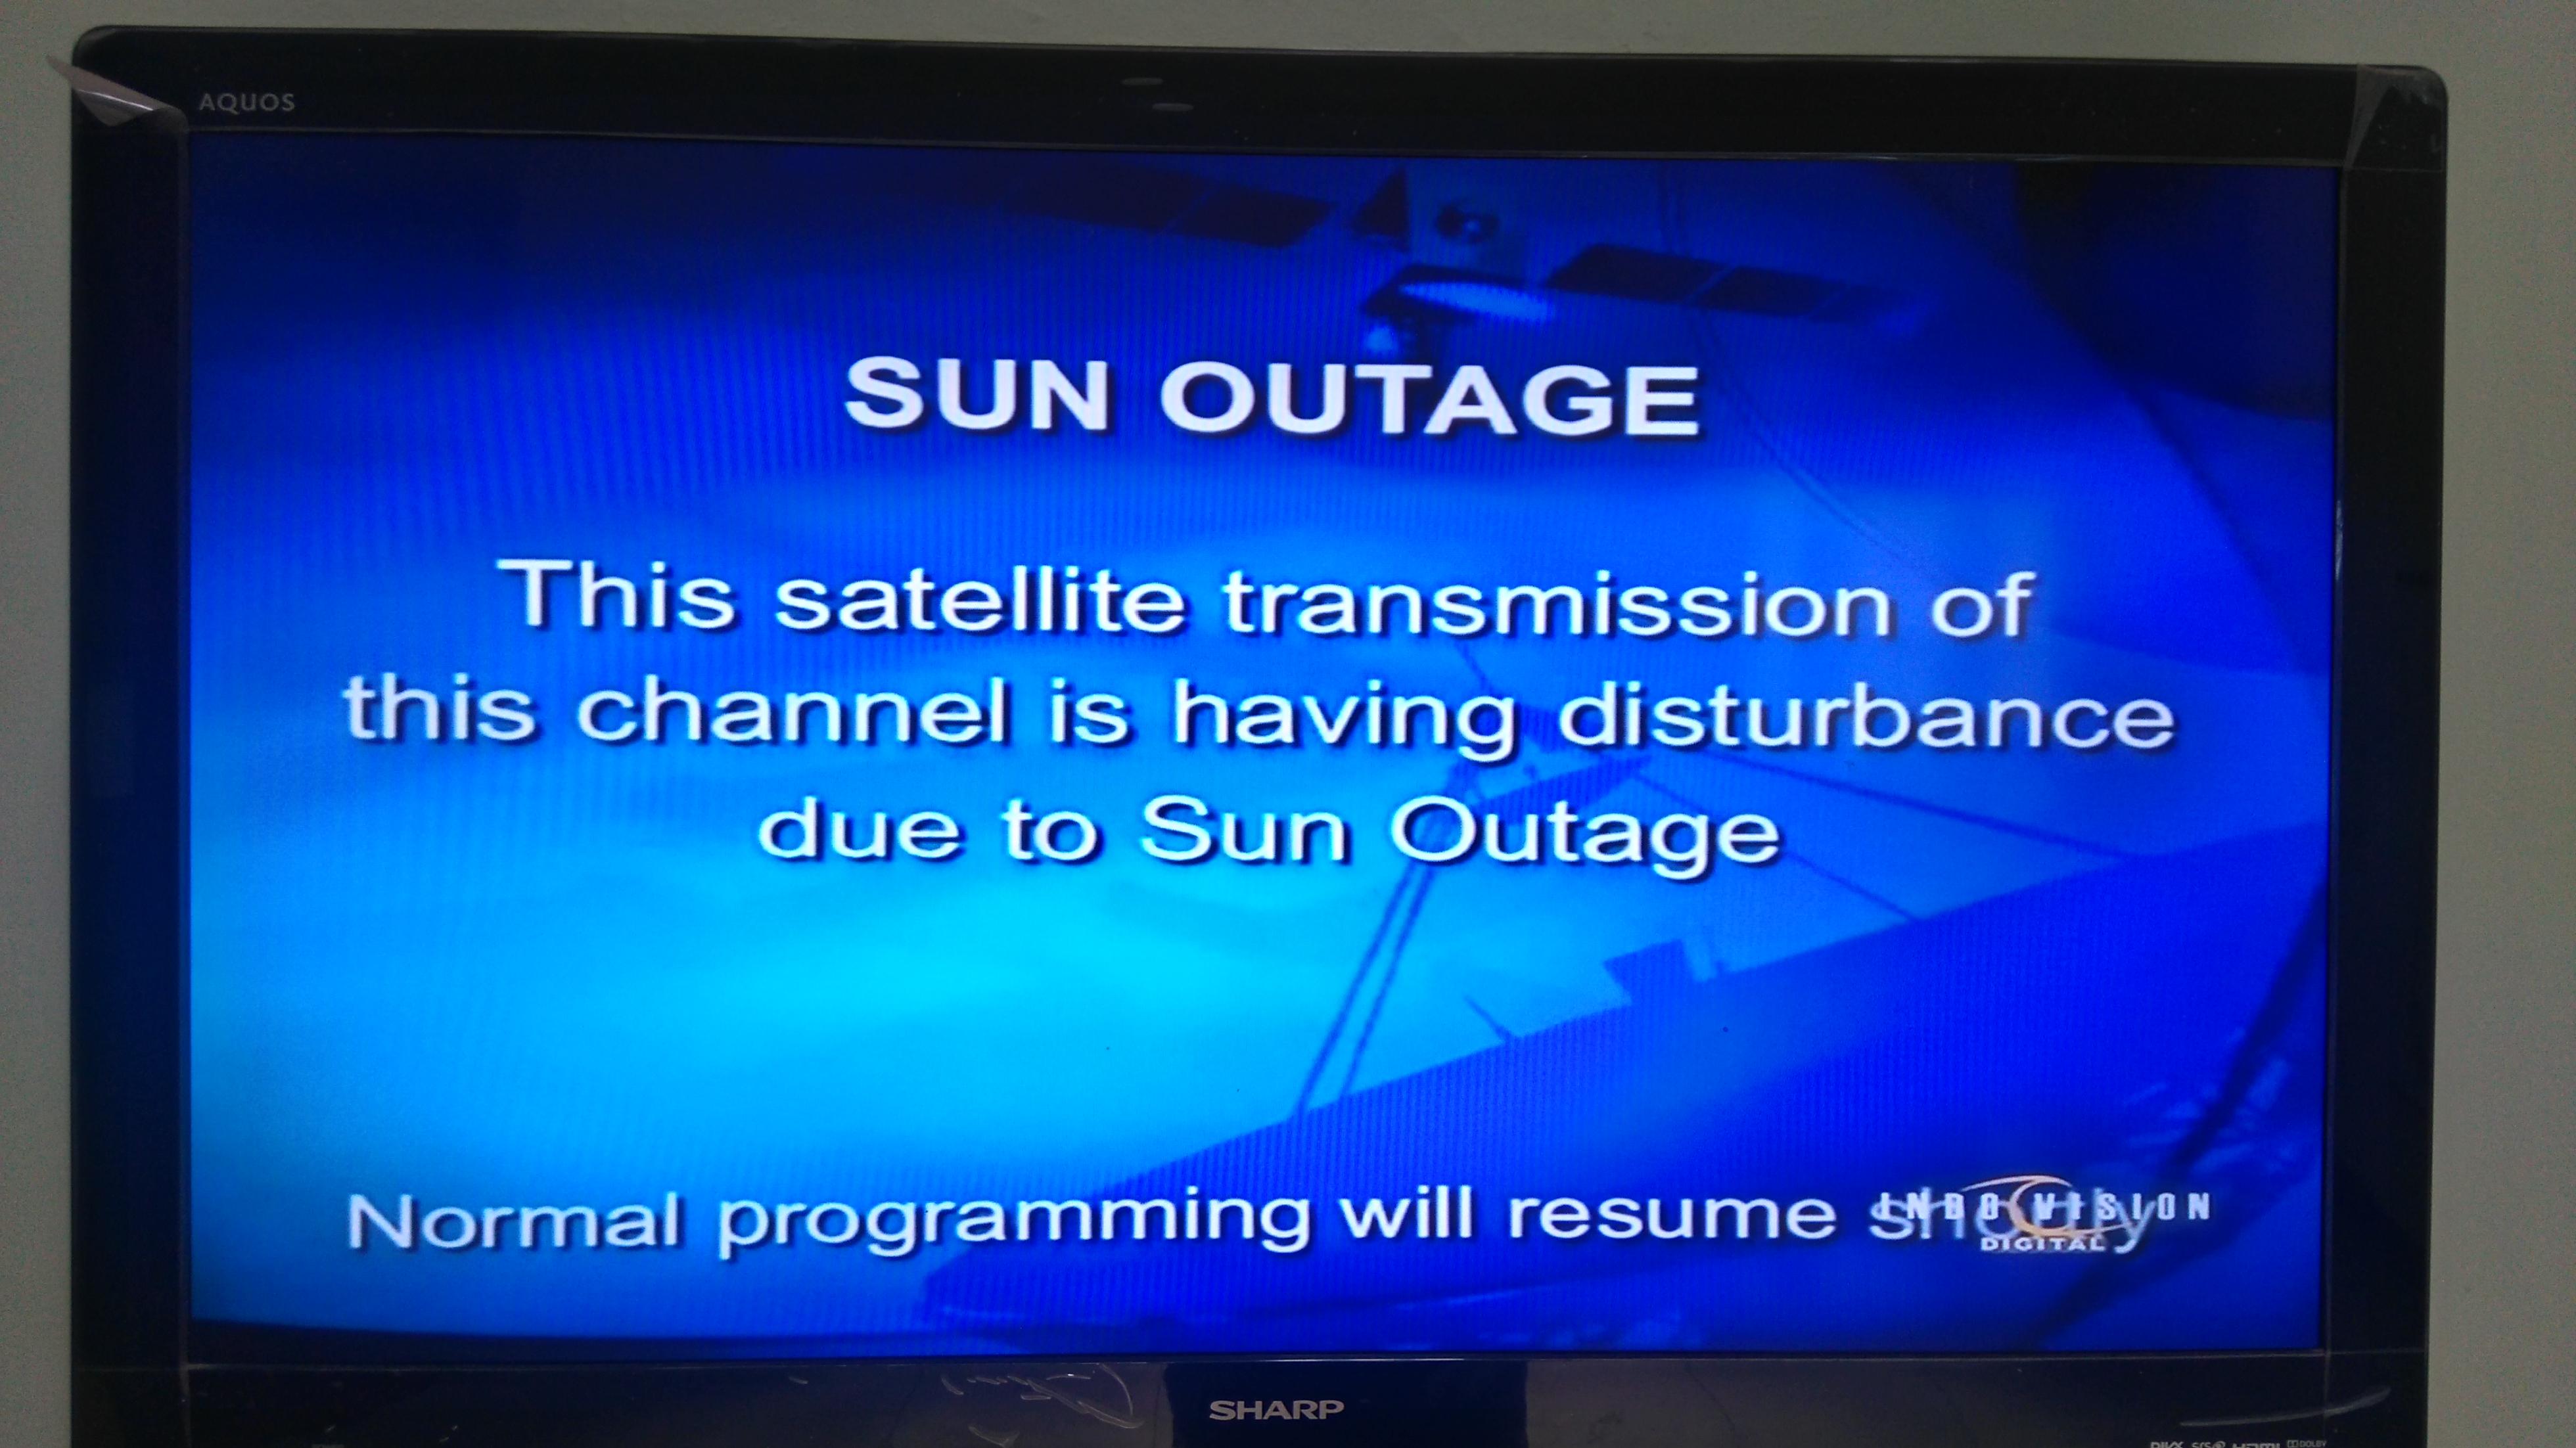 Sun outage - Wikipedia